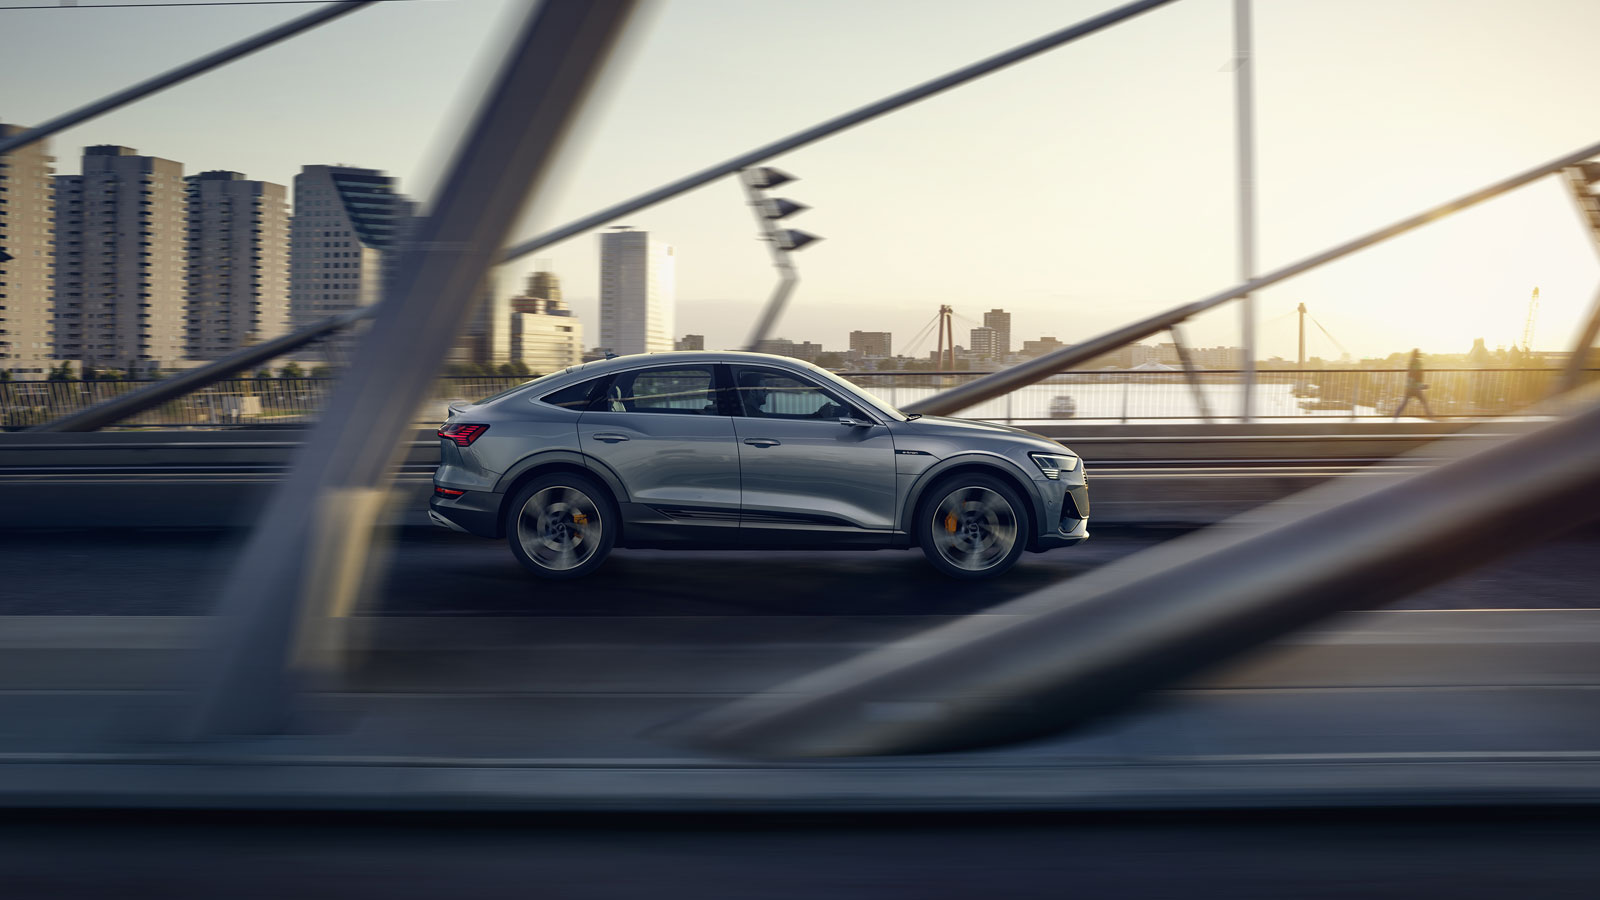 Audi Side View